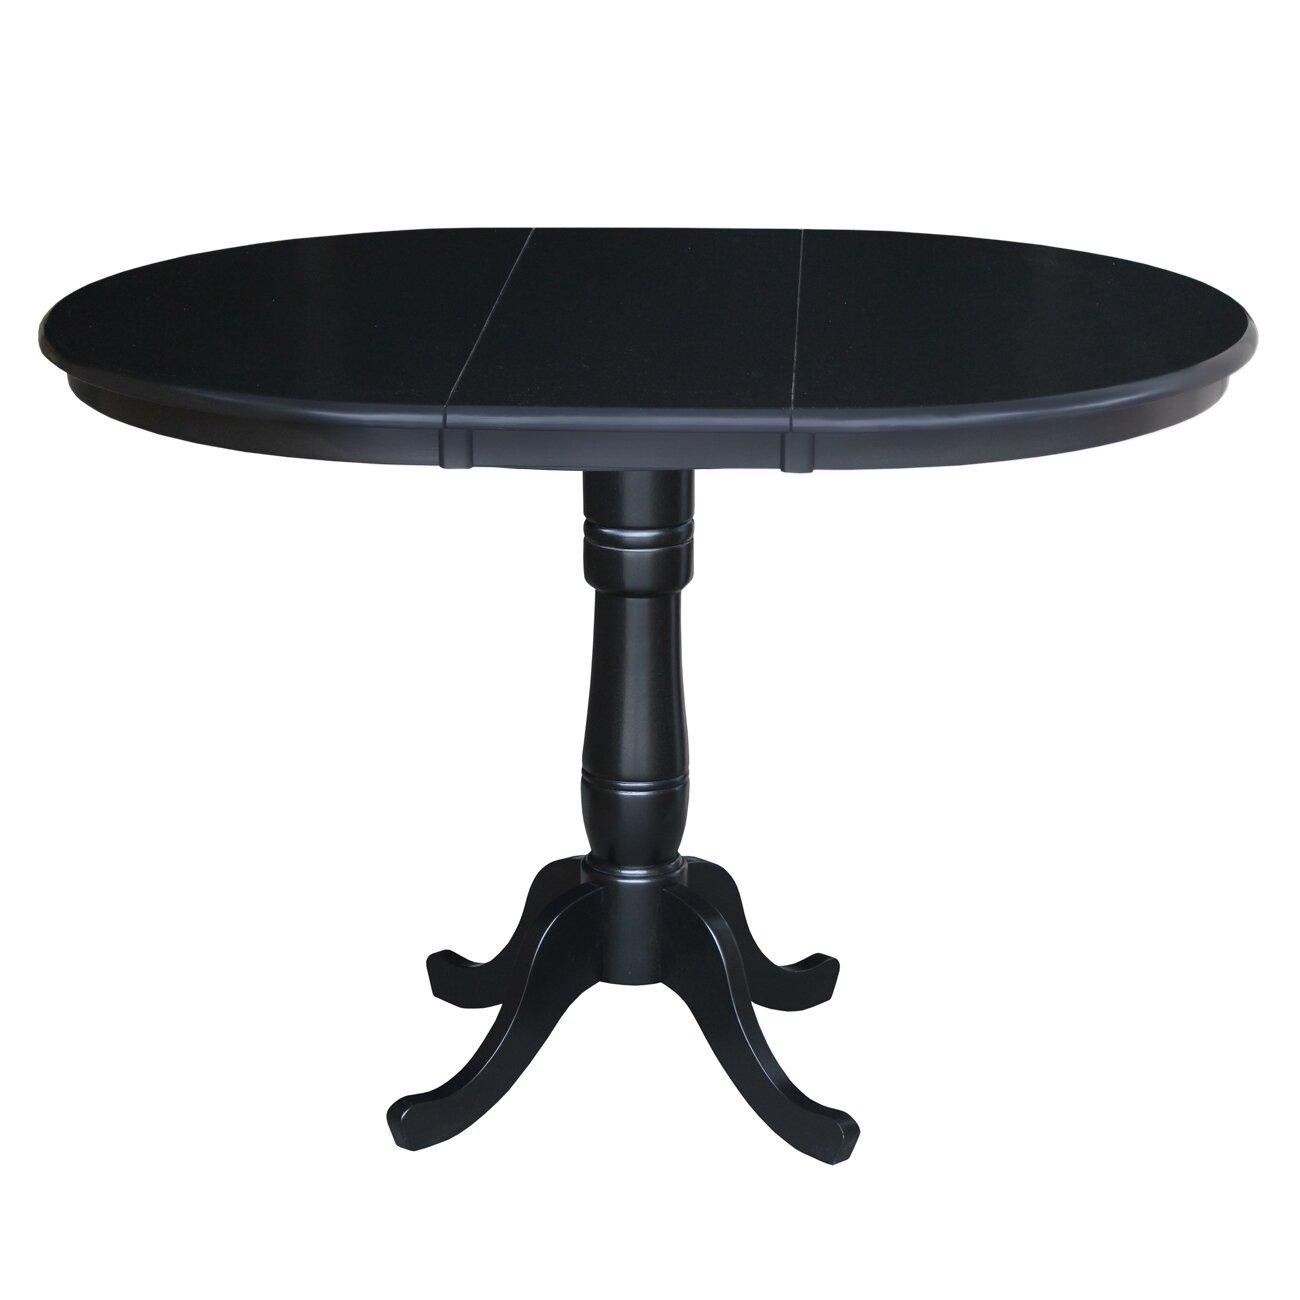 International Concepts Round Pedestal Bar Height Pub Table